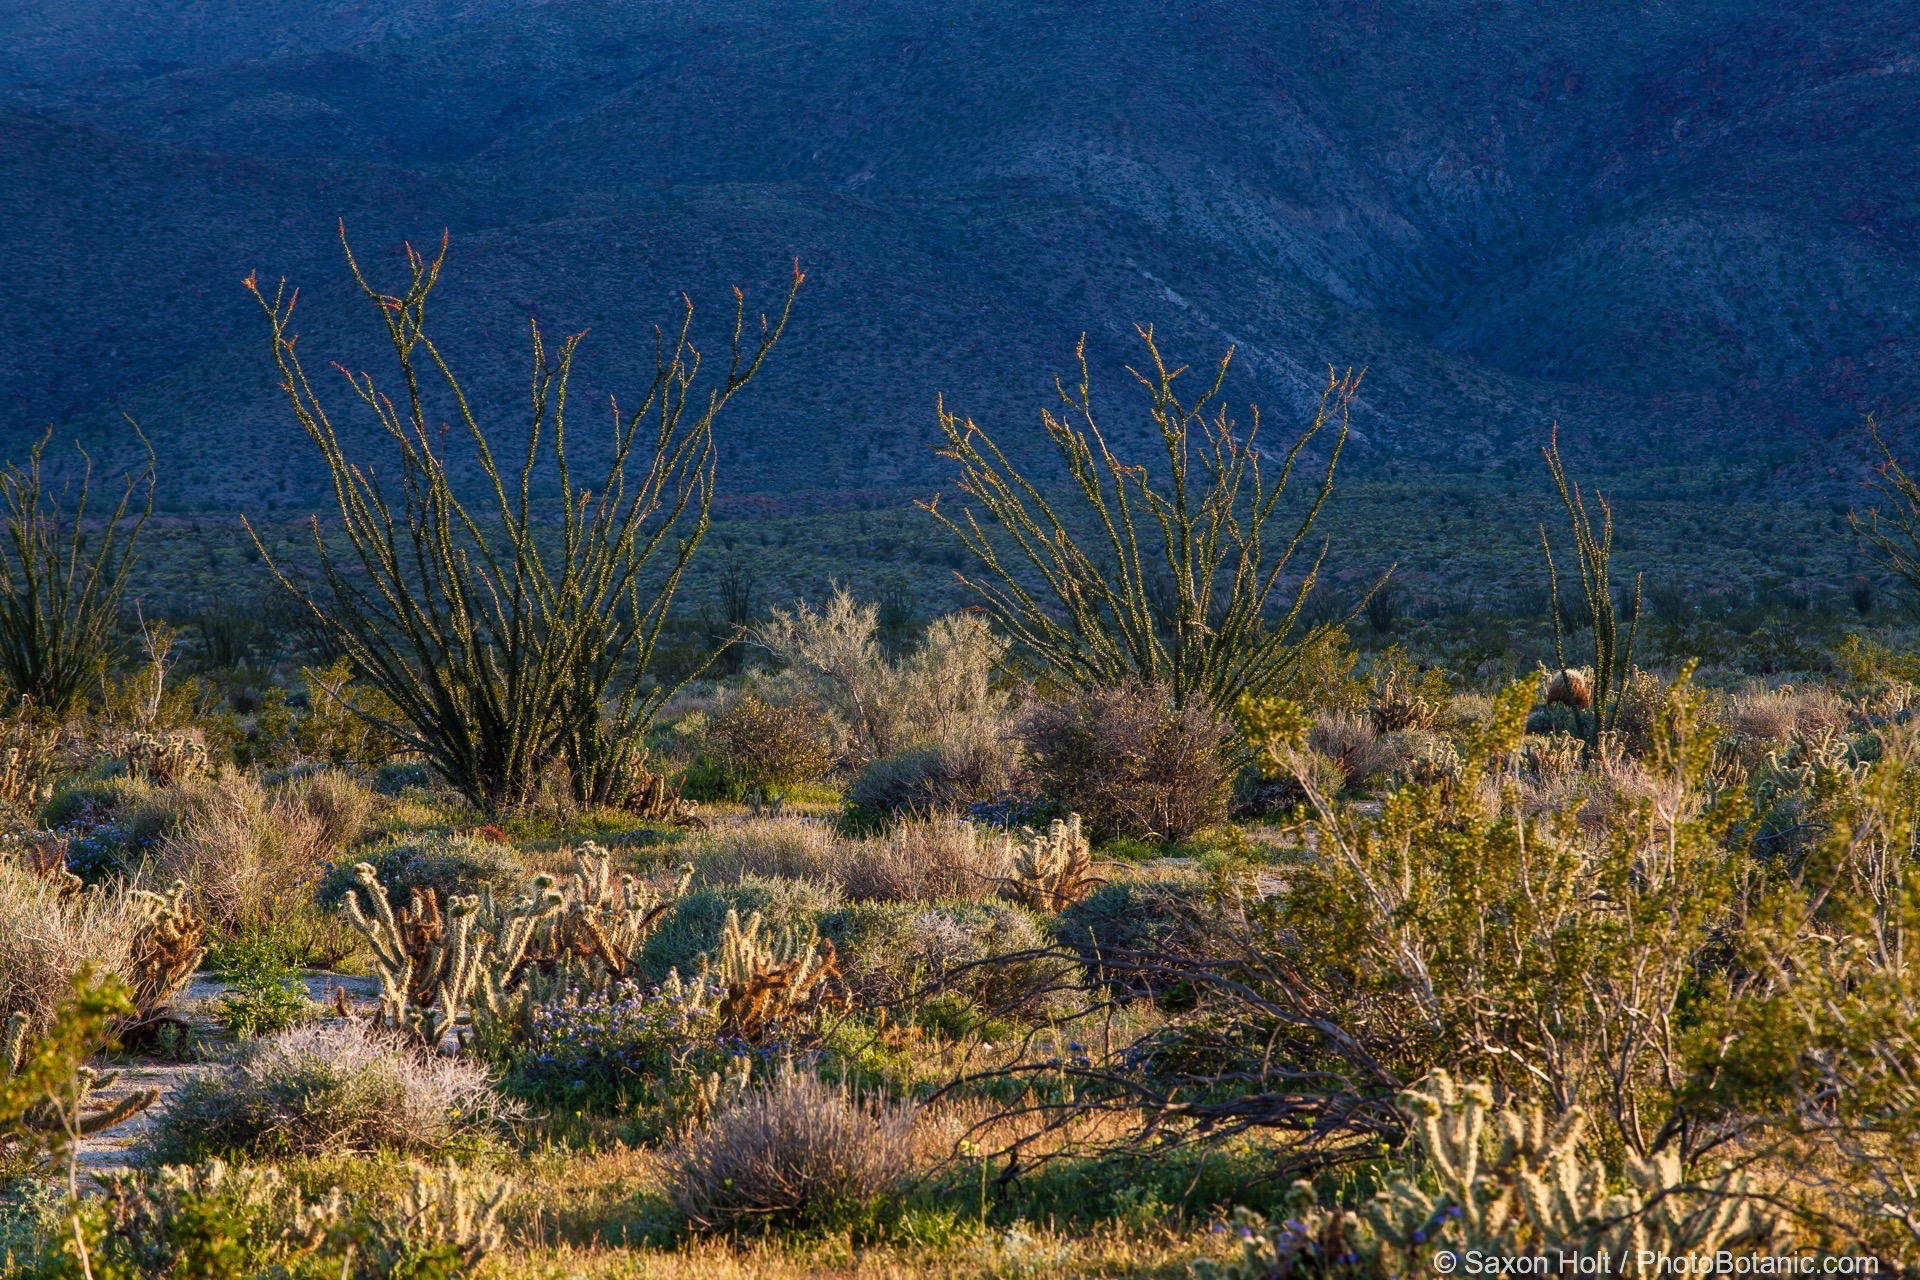 Desert landscape of California native plants in early morning, Glorietta Canyon, Anza Borrego State Park